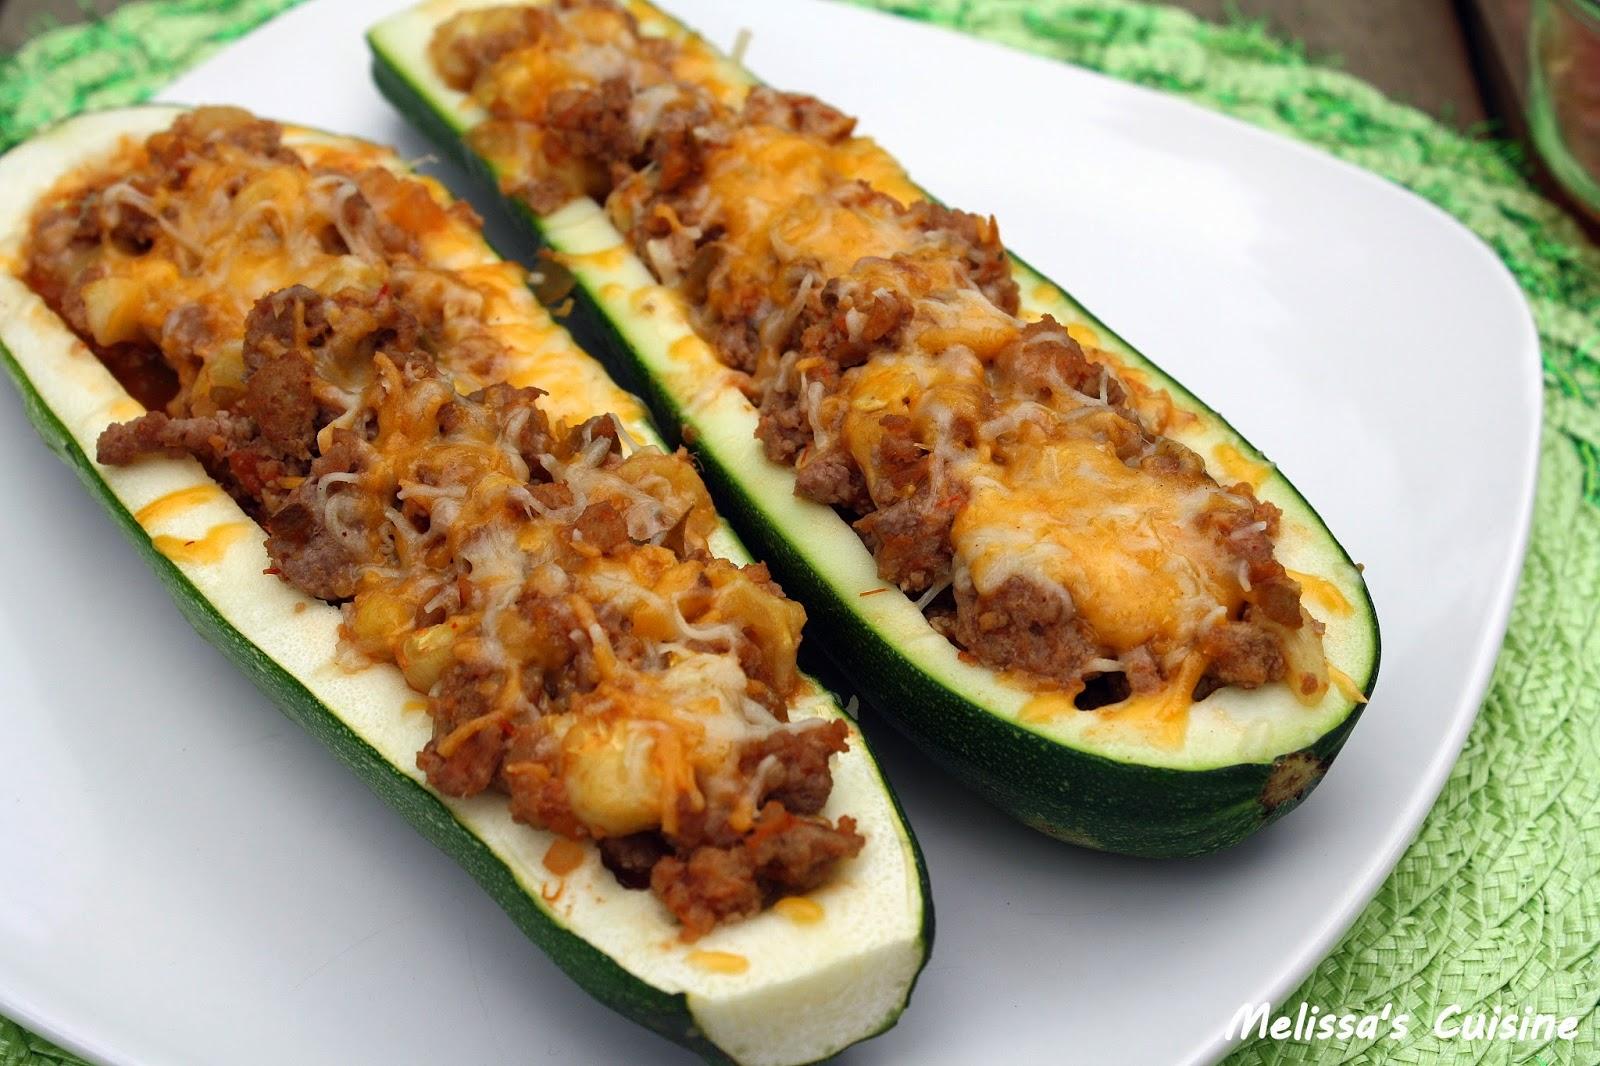 Melissa's Cuisine: Stuffed Zucchini Boats